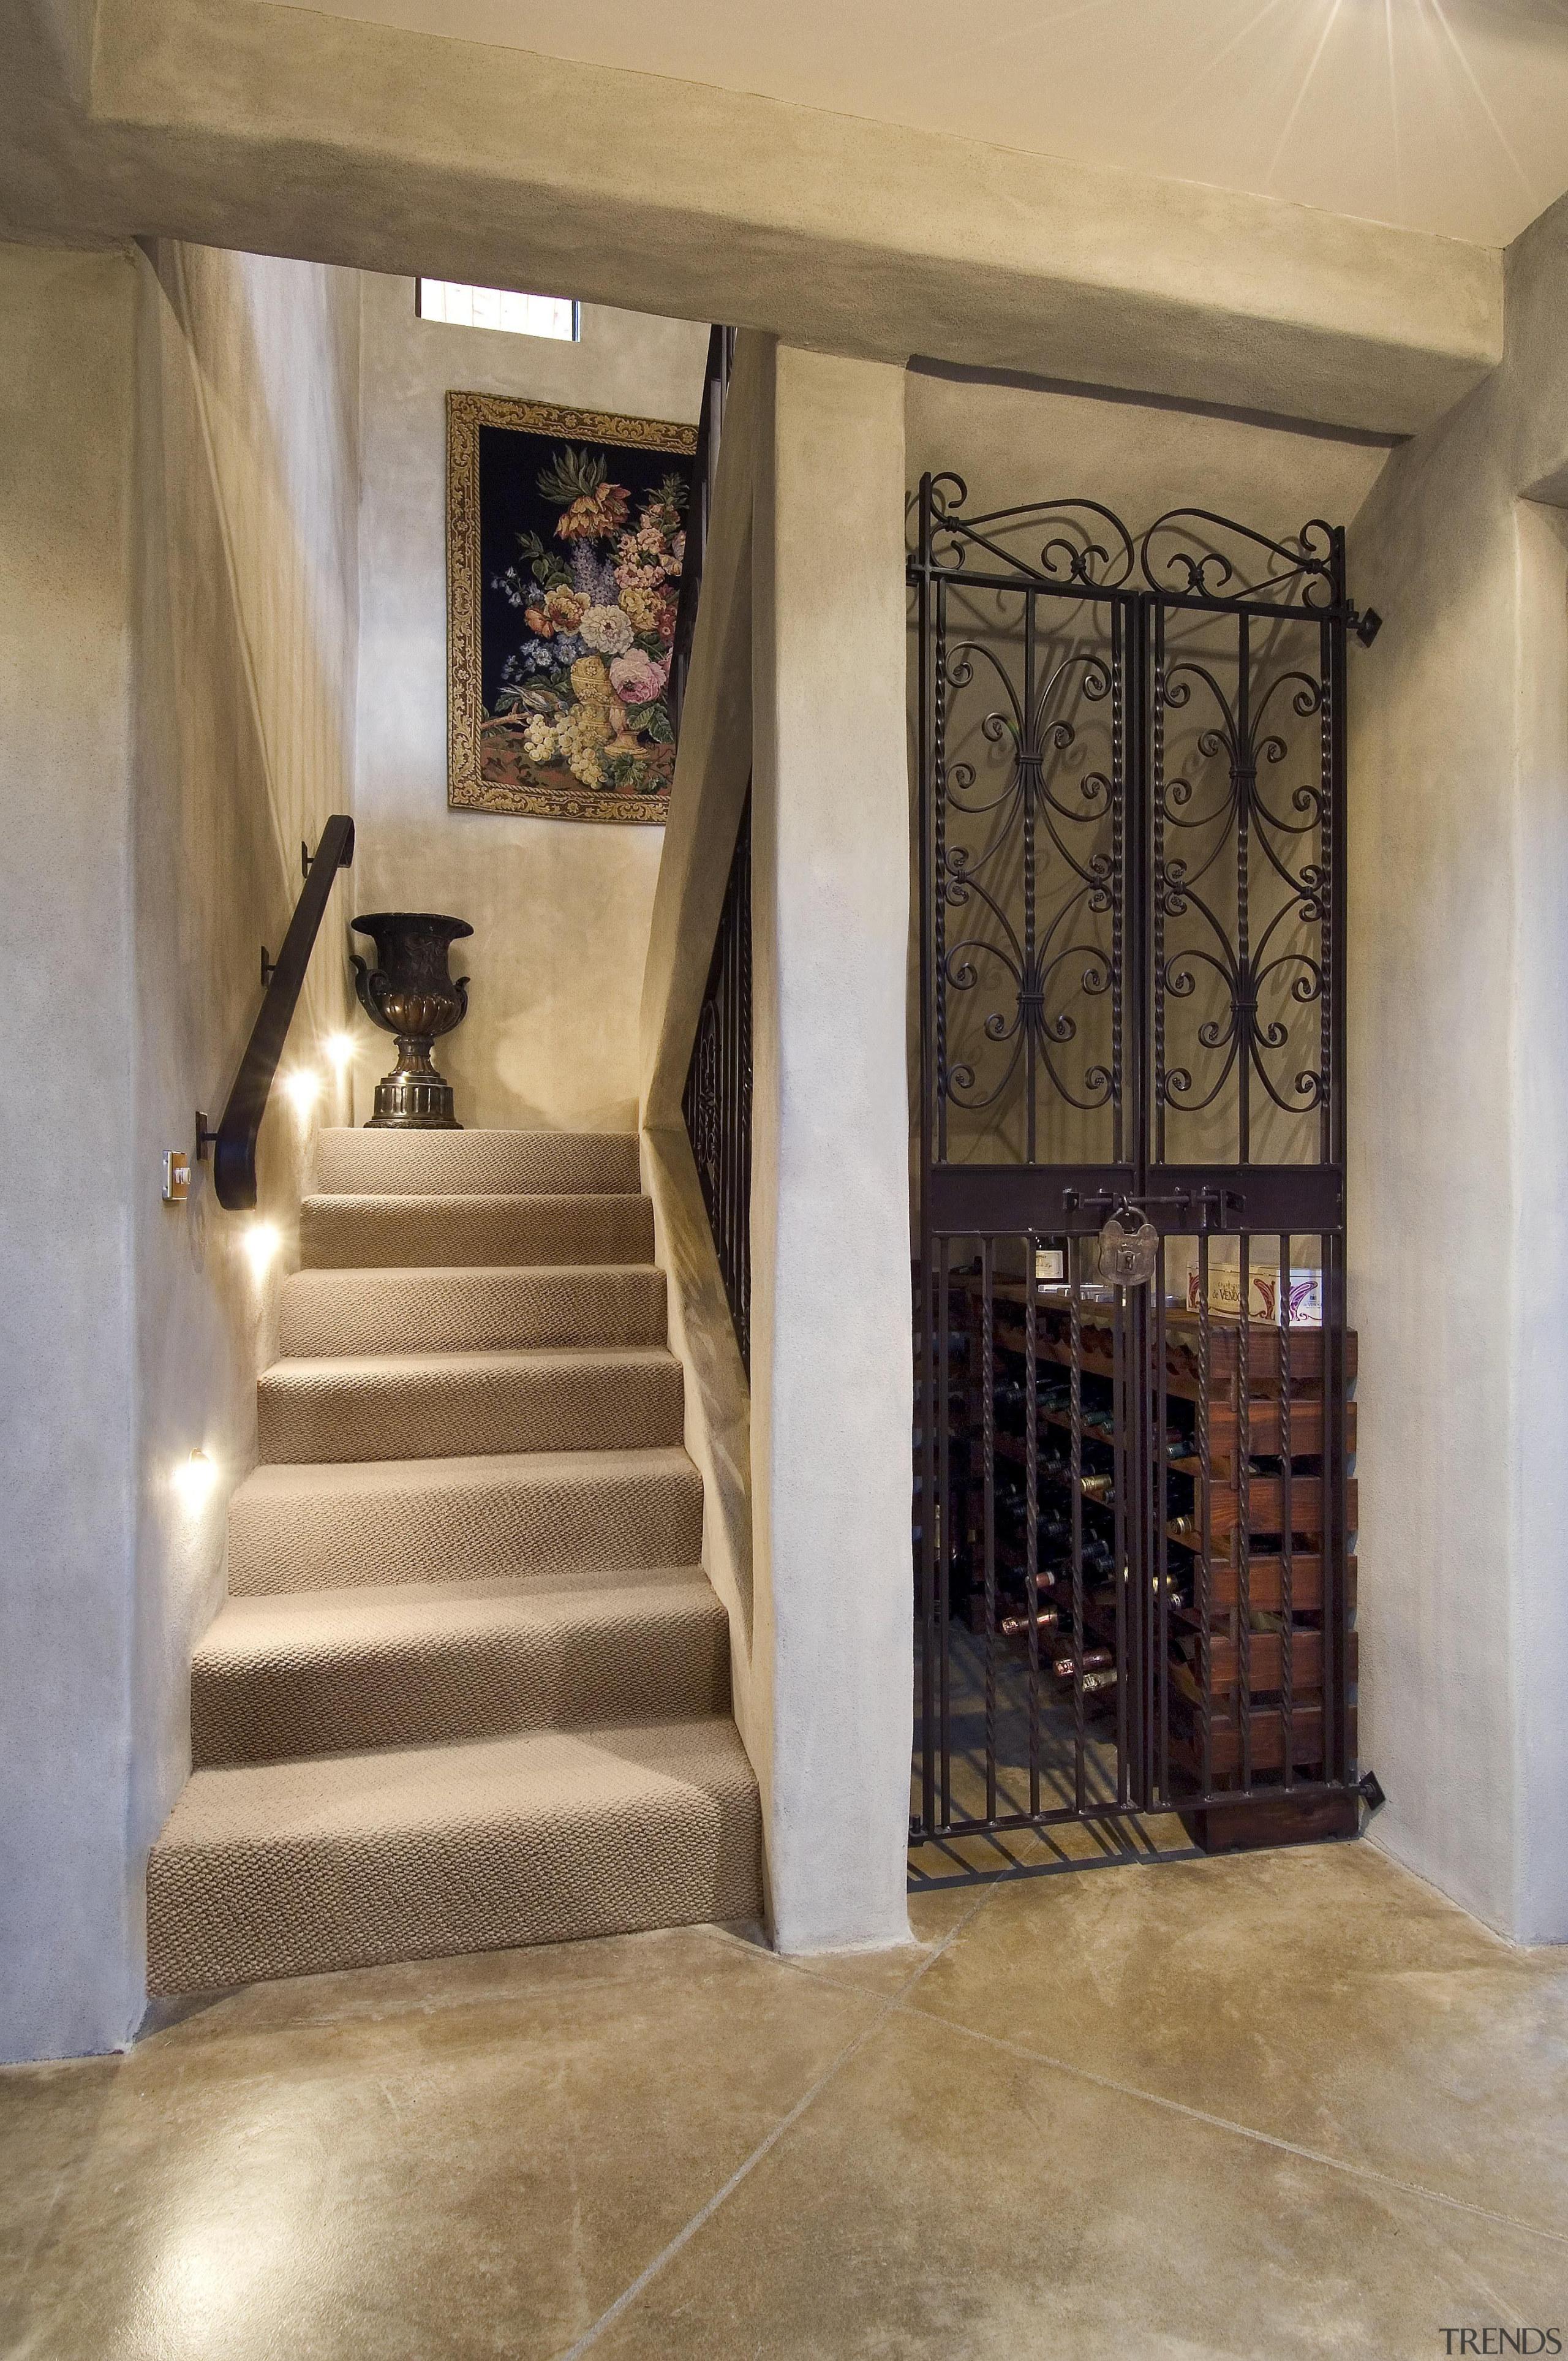 164mangawhai 6 - mangawhai_6 - floor | flooring floor, flooring, handrail, interior design, stairs, brown, gray